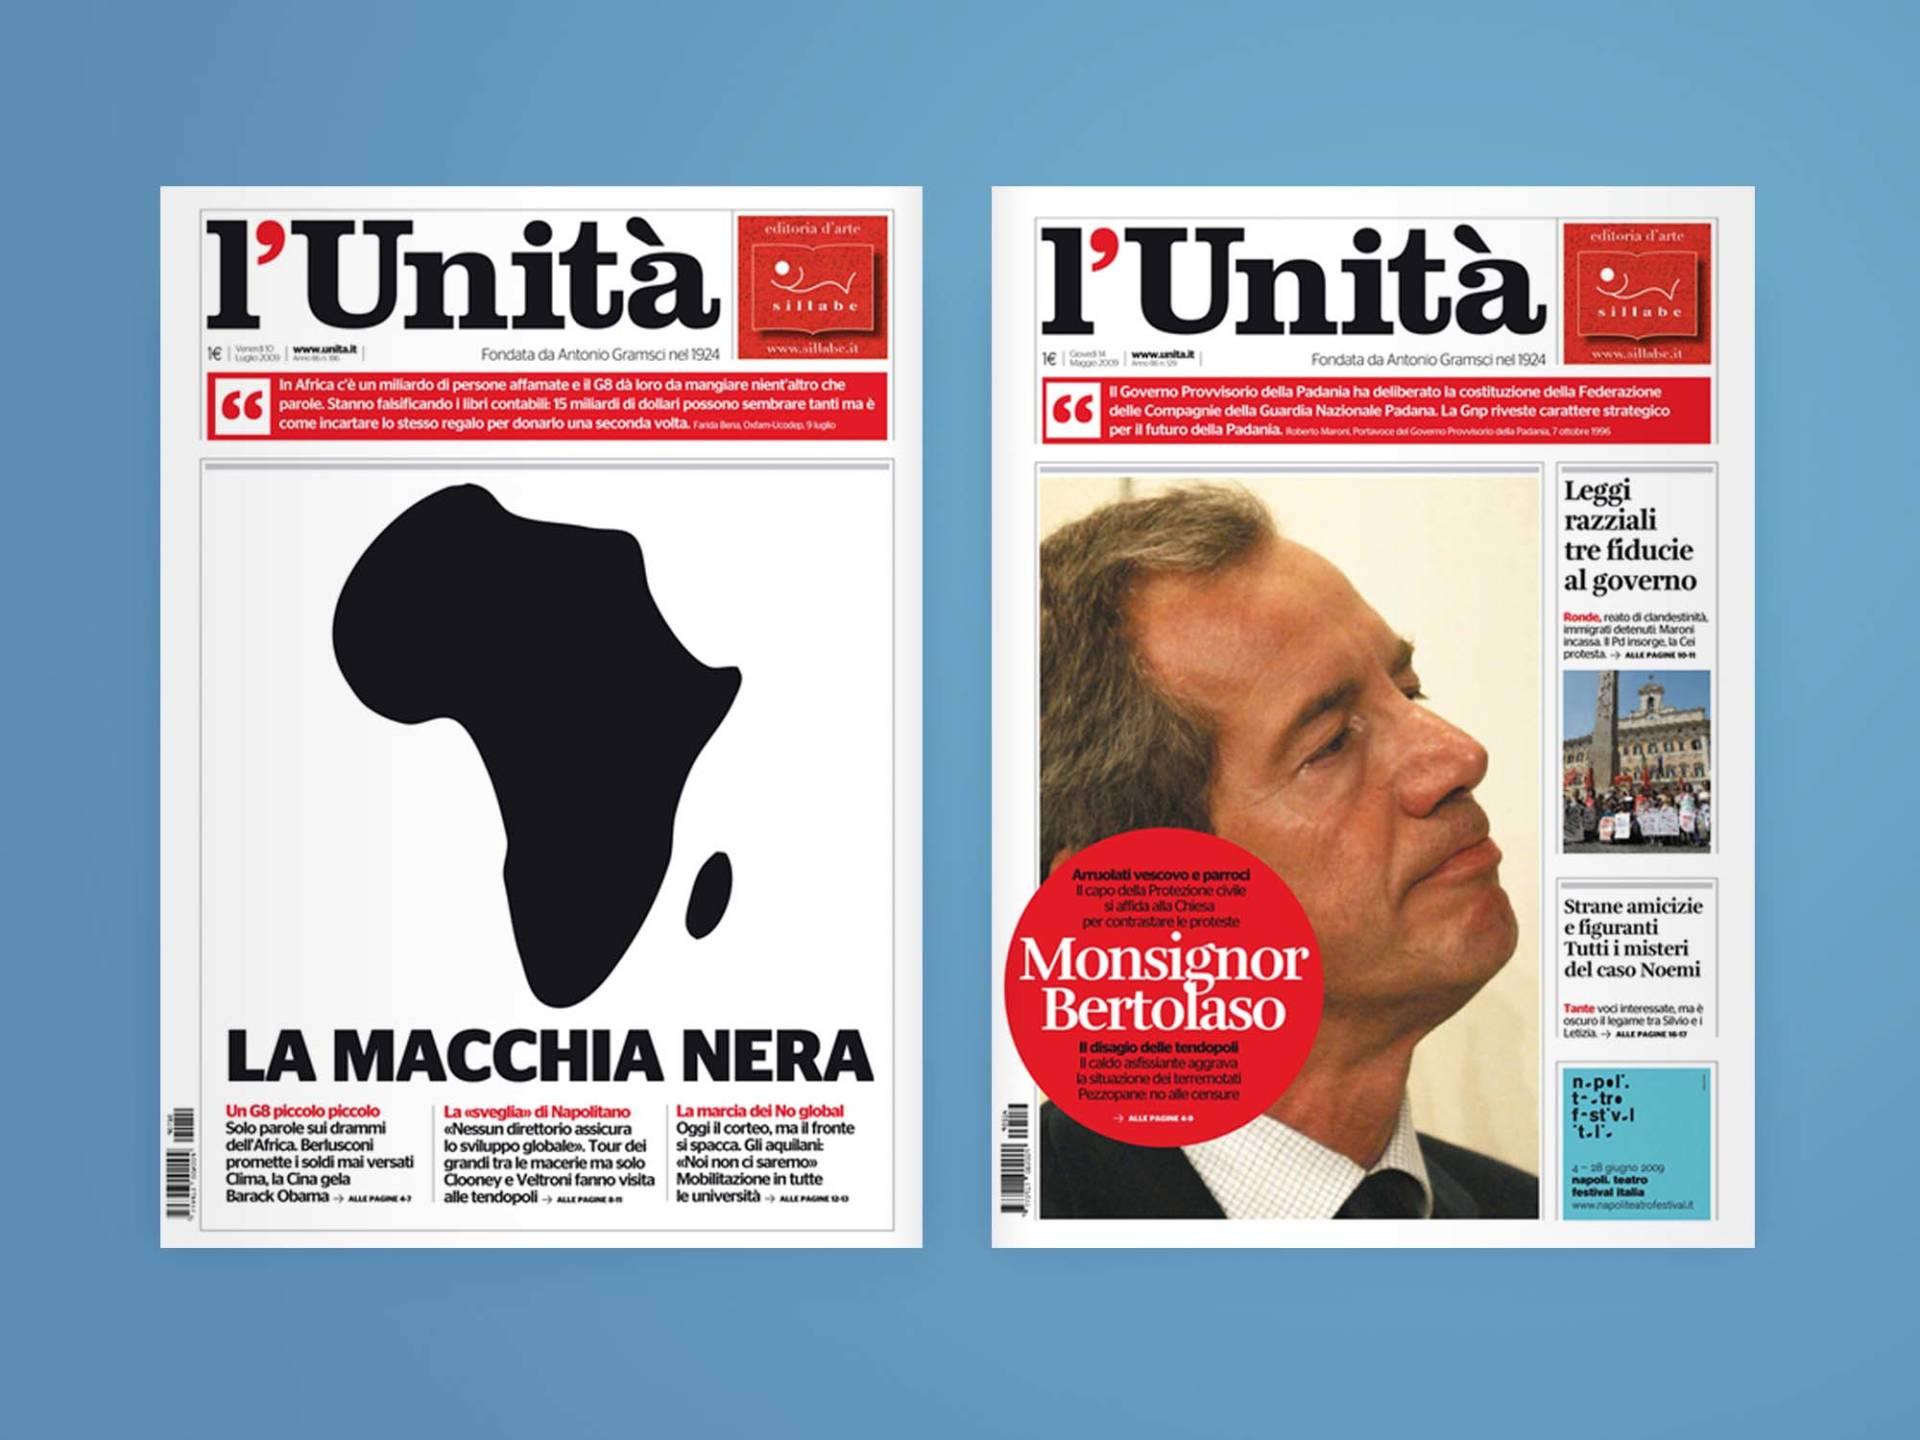 L'Unità_03_Wenceslau_News_Design